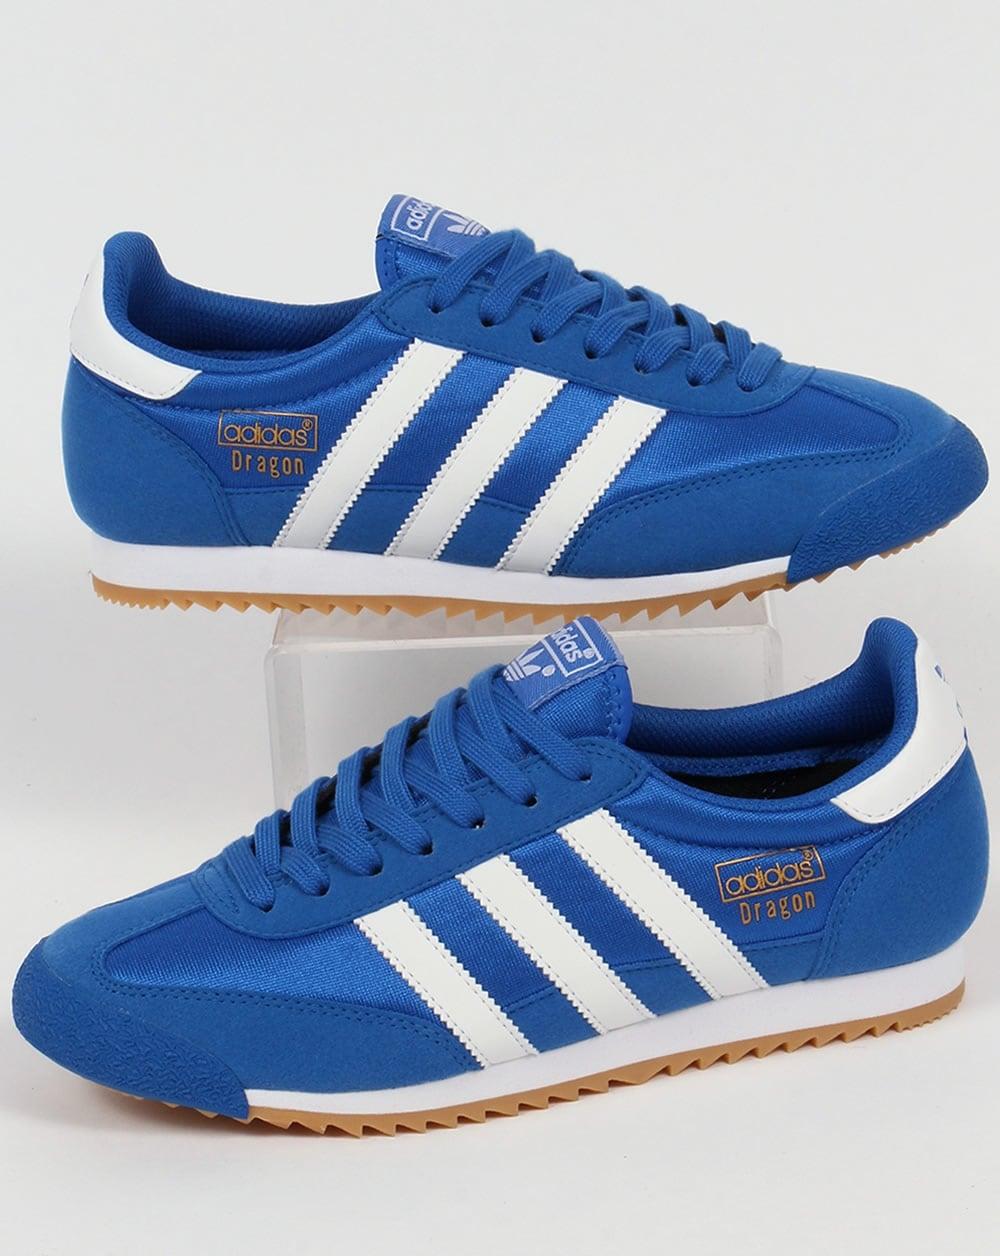 Adidas Retro adidas trainers adidas dragon trainers blue/white IIGRFPW